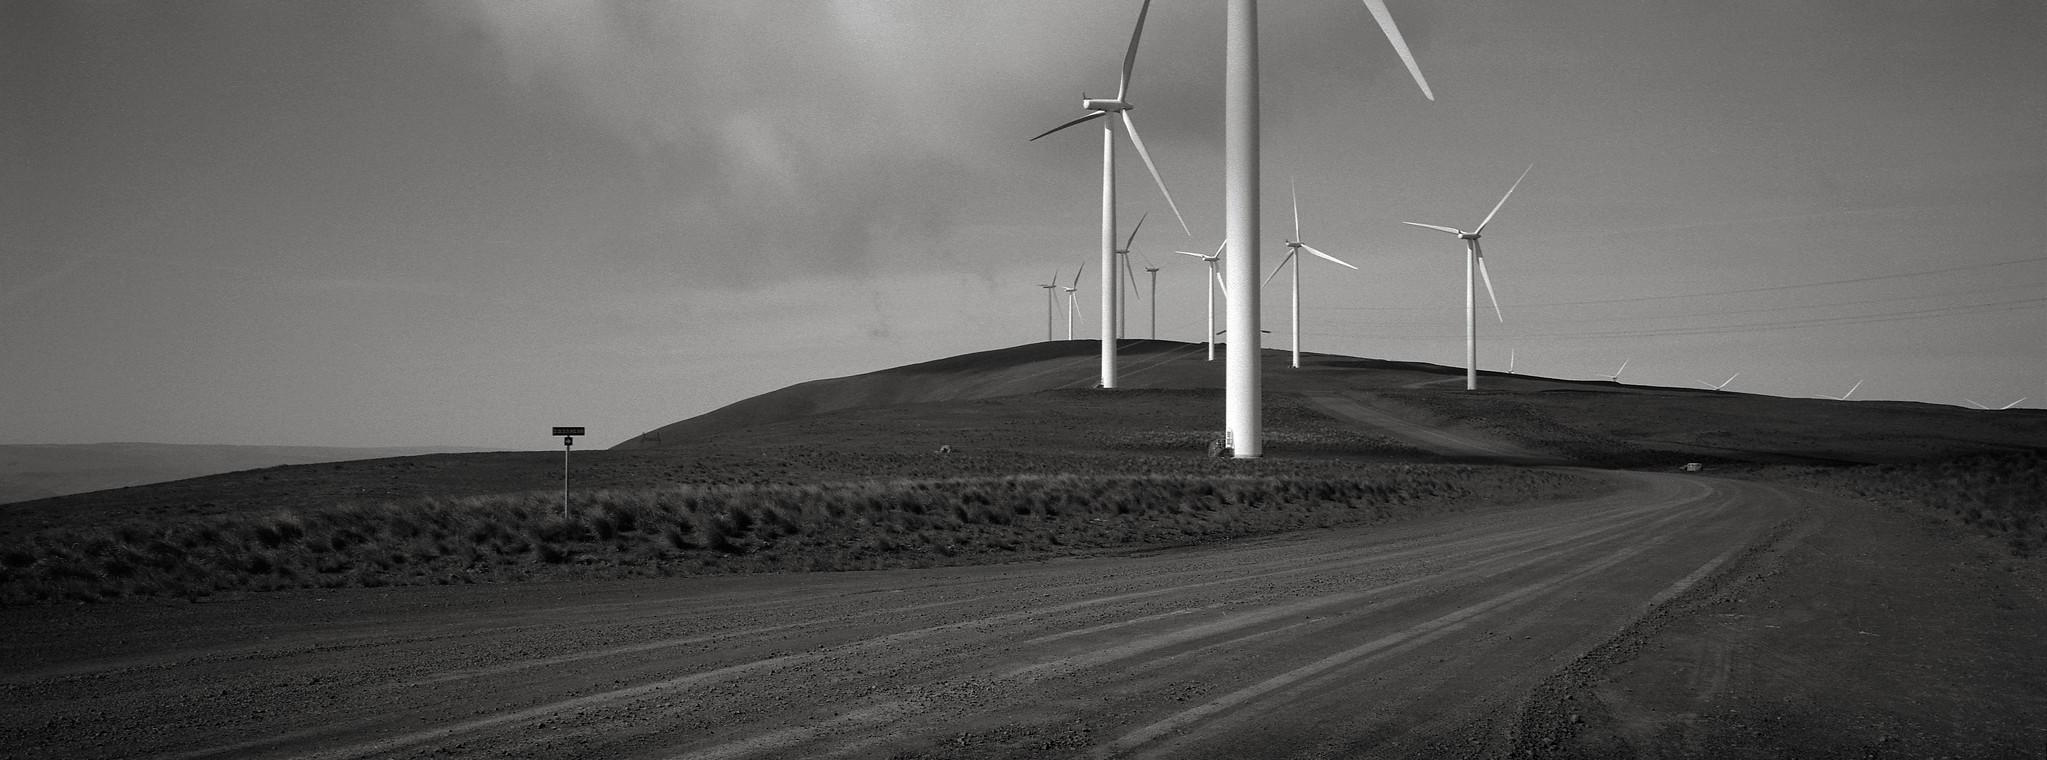 Wind Turbines, Washington   by austin granger